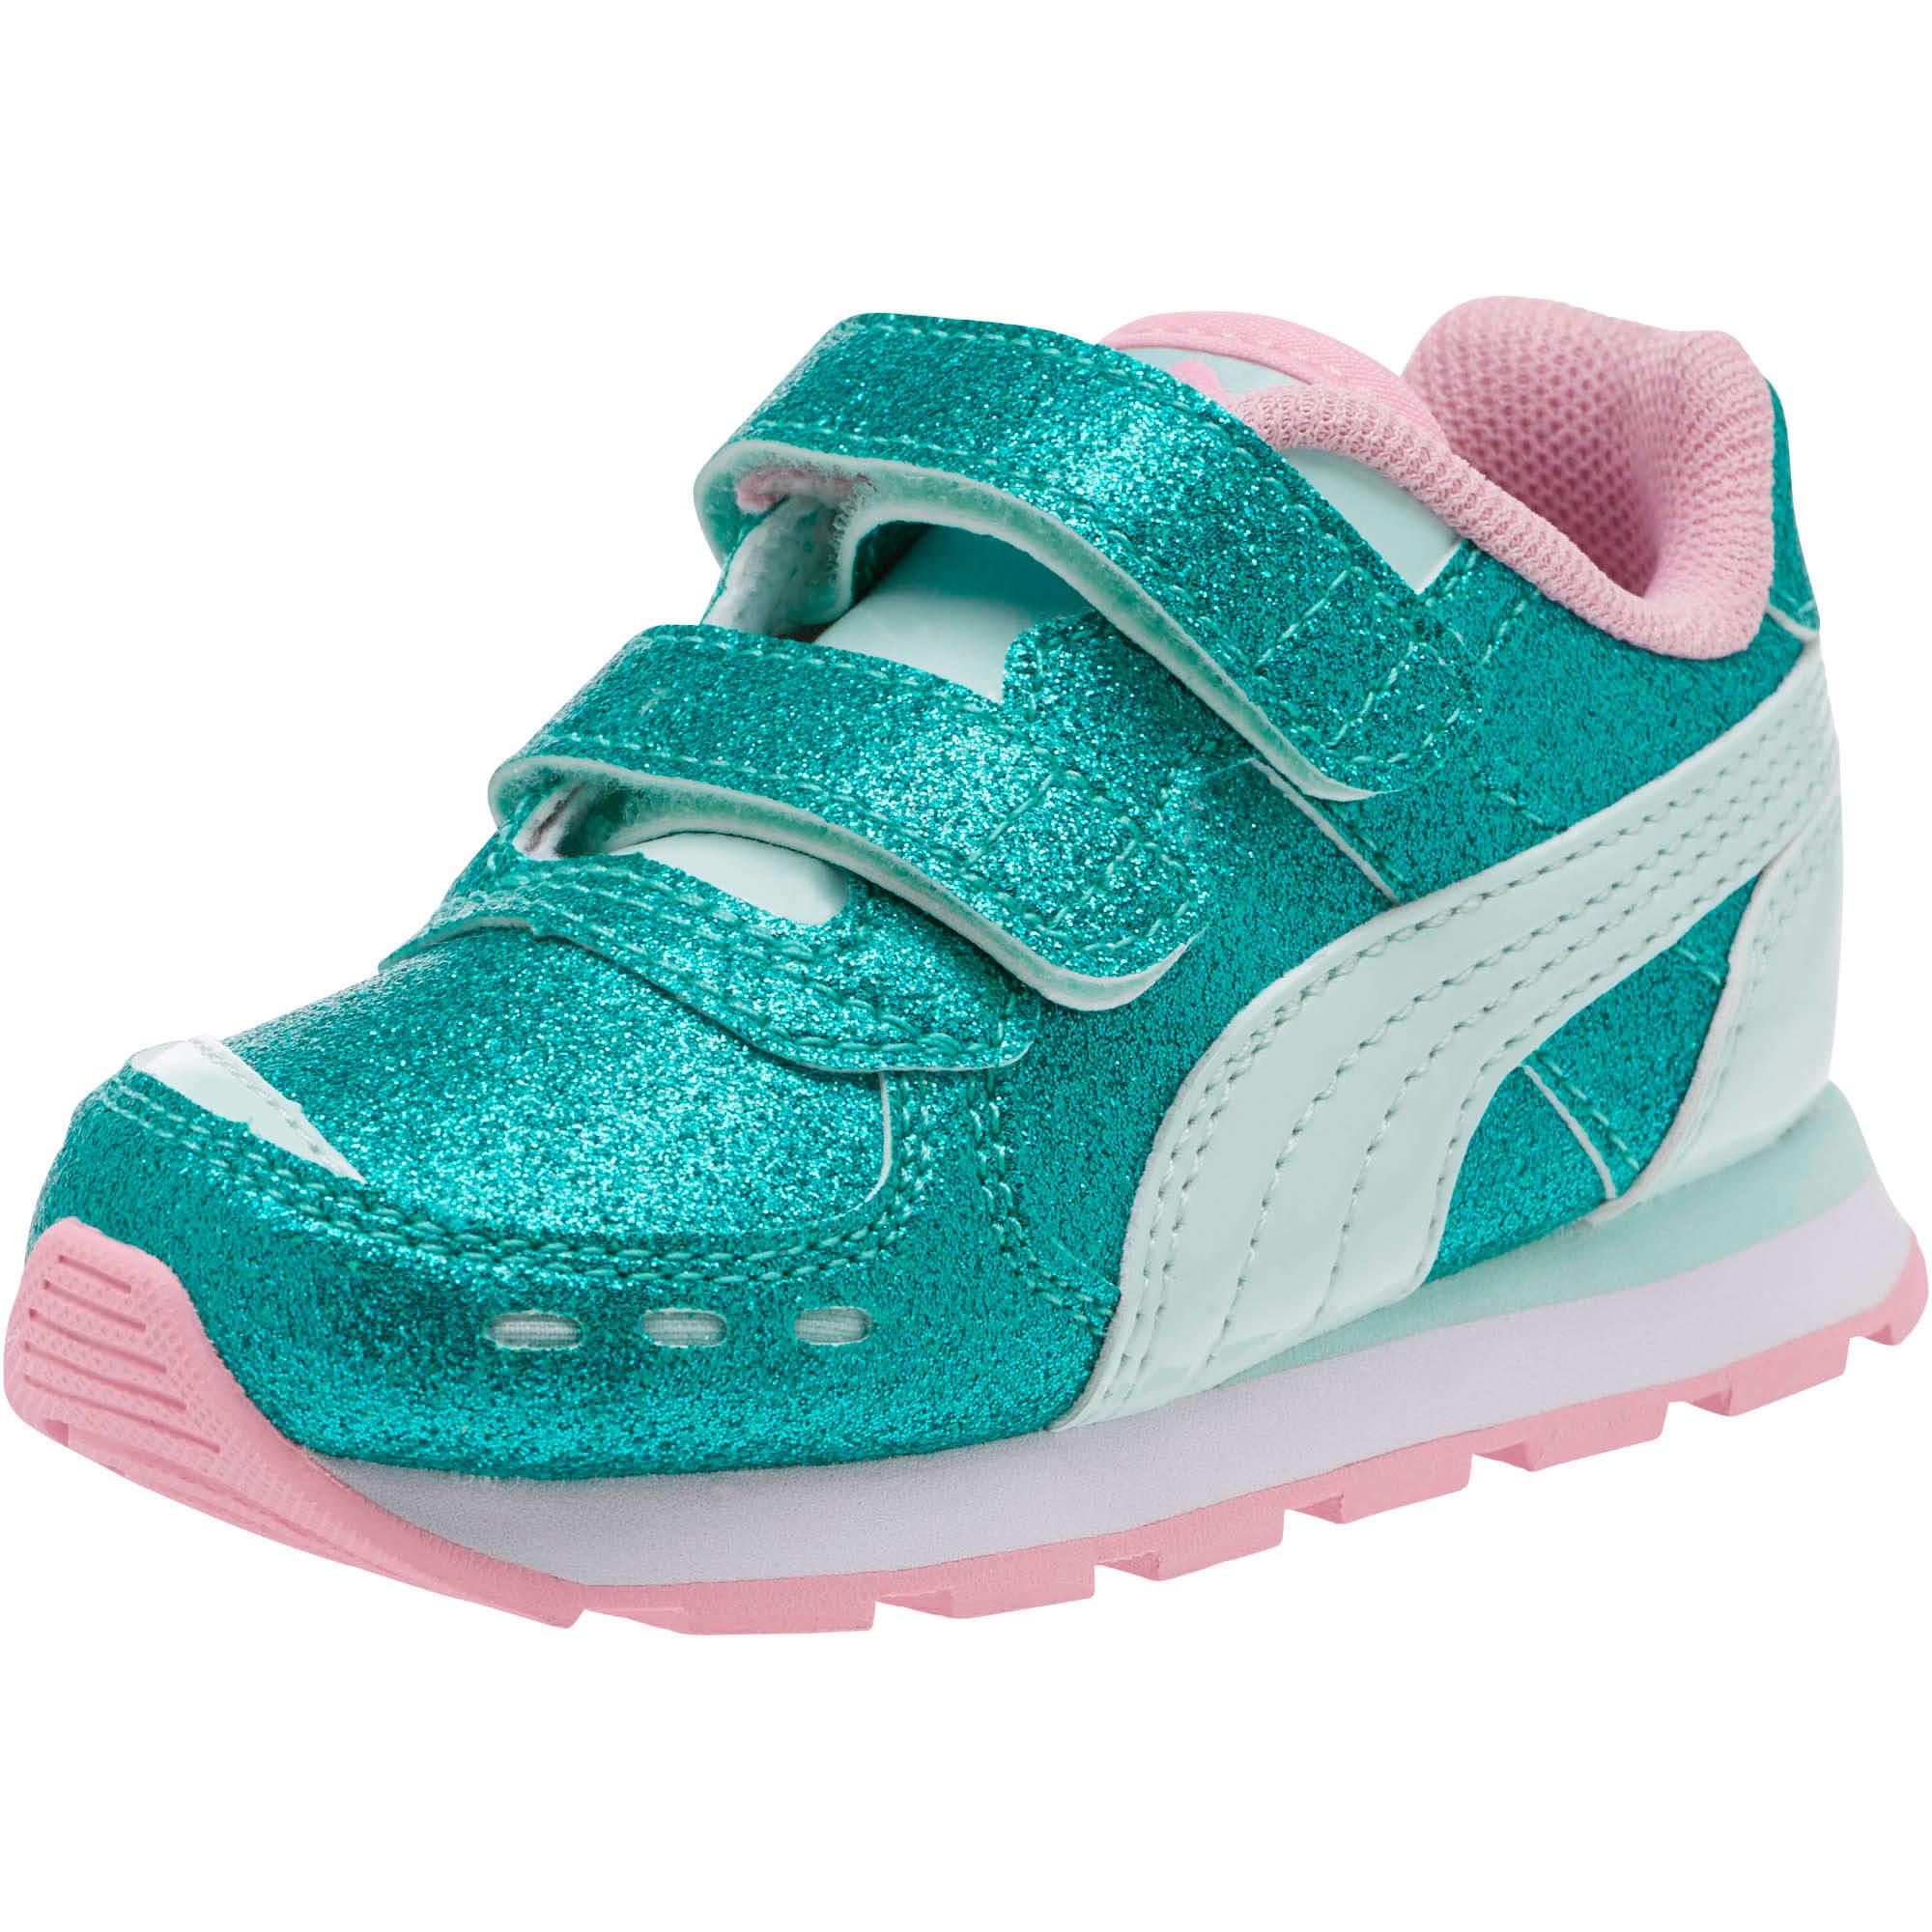 Thumbnail 1 of Vista Glitz Toddler Shoes, Fair Aqua-Pale Pink, medium